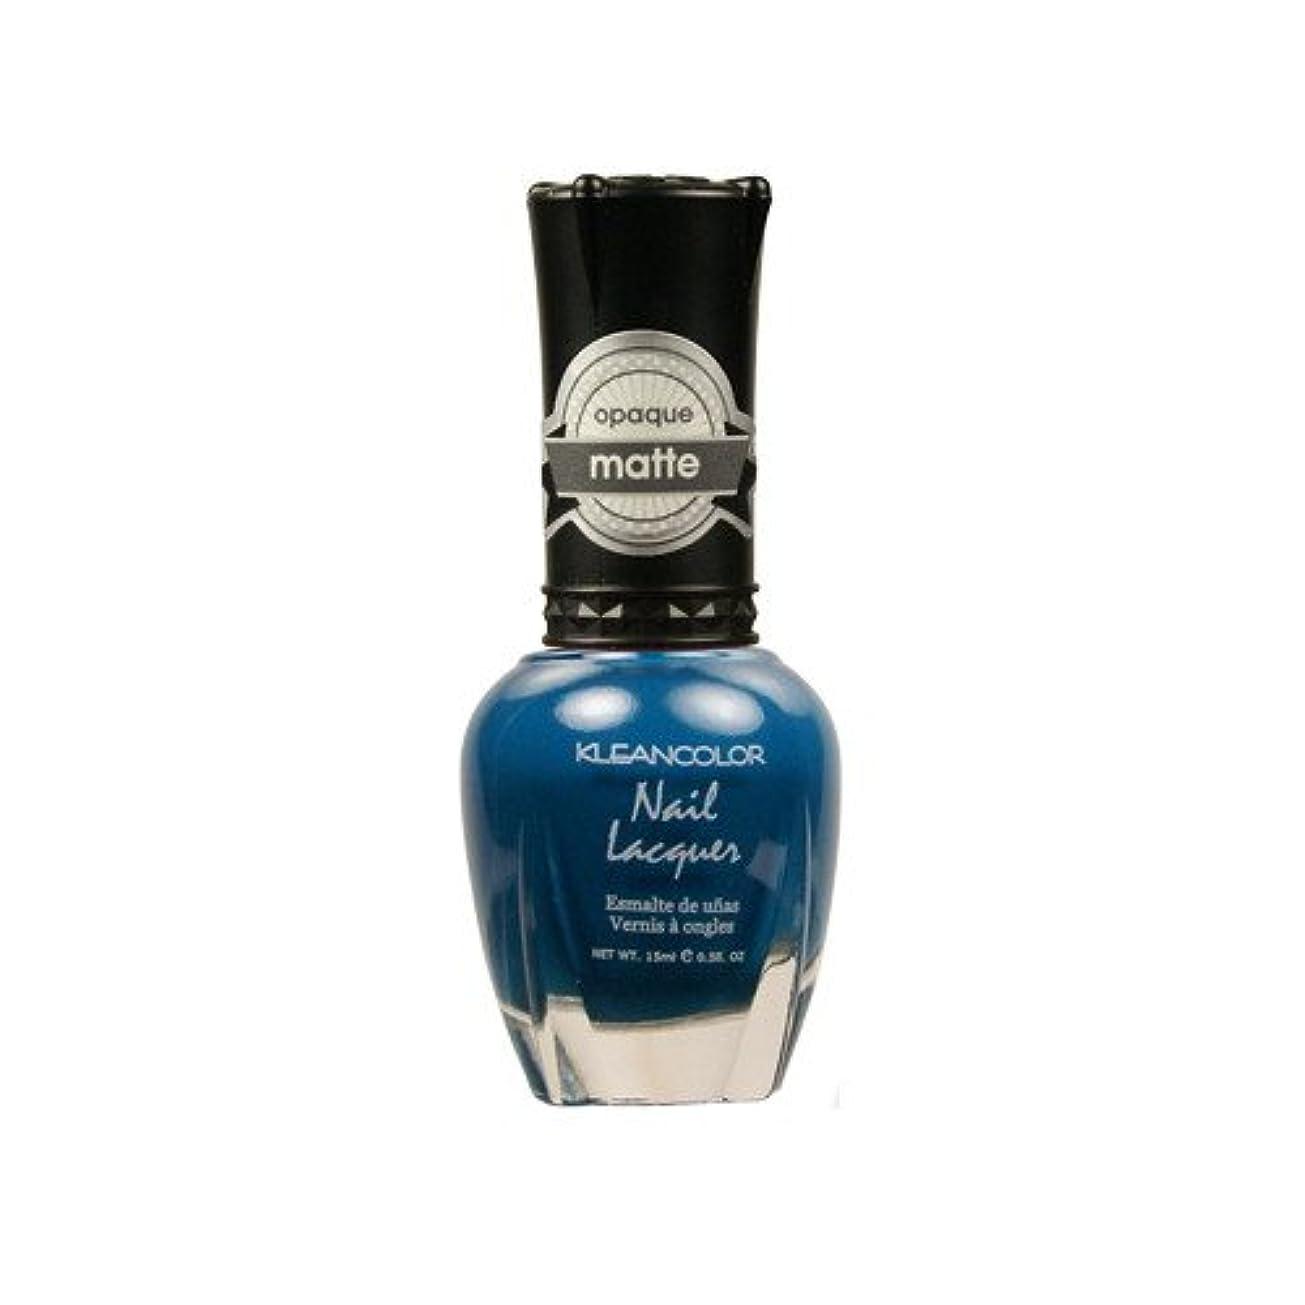 KLEANCOLOR Matte Nail Lacquer - Sensual Lagoon (並行輸入品)